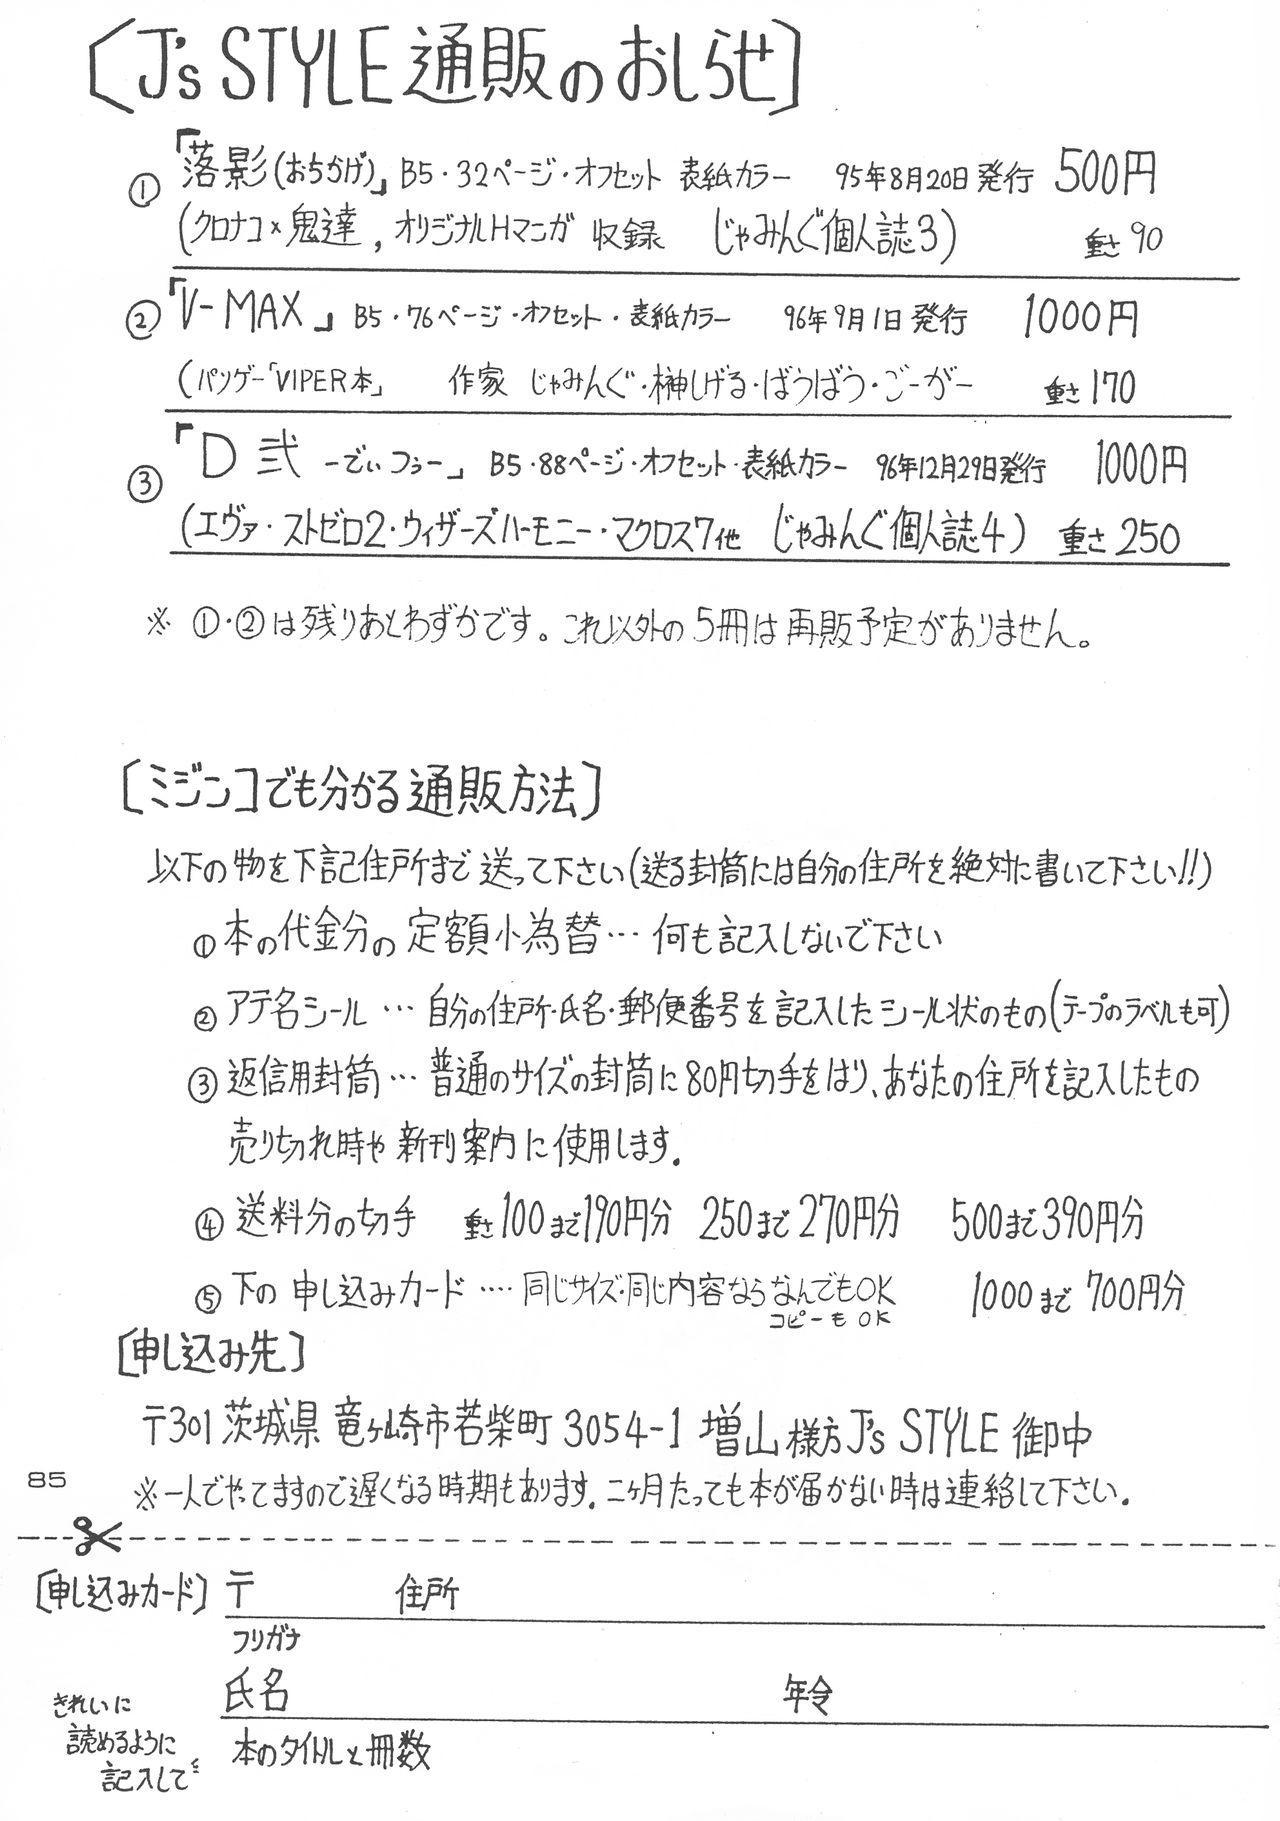 (C51) [J's Style (Jamming)] D2 (DOUBT TO DOUBT) Jamming Kojinshi 4 -Ditsuu- (Various) 84